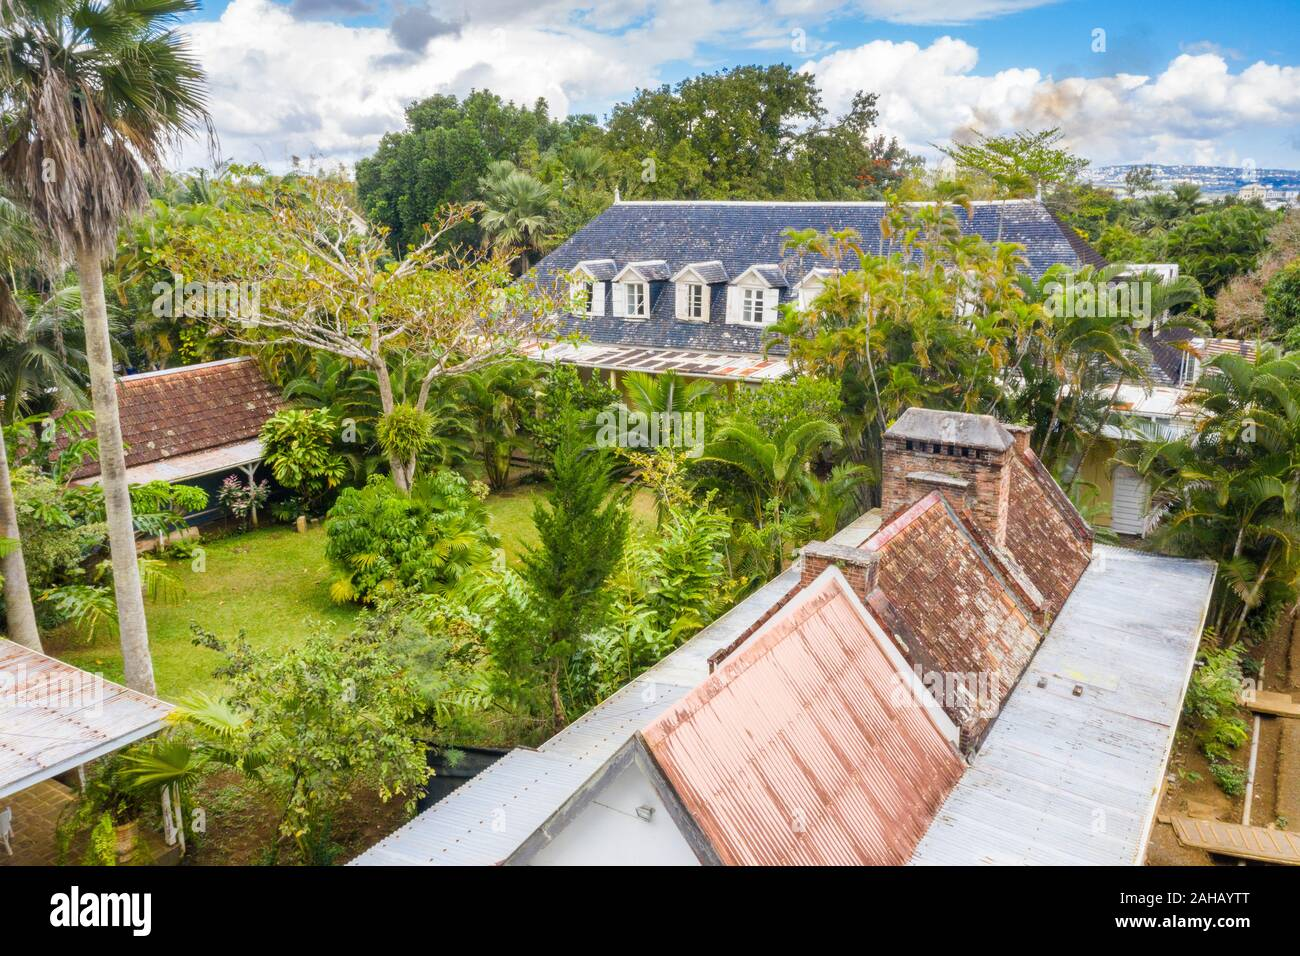 Eureka La Maison Creole house and gardens, aerial view, Moka, Montagne Ory, Indian Ocean, Mauritius Stock Photo